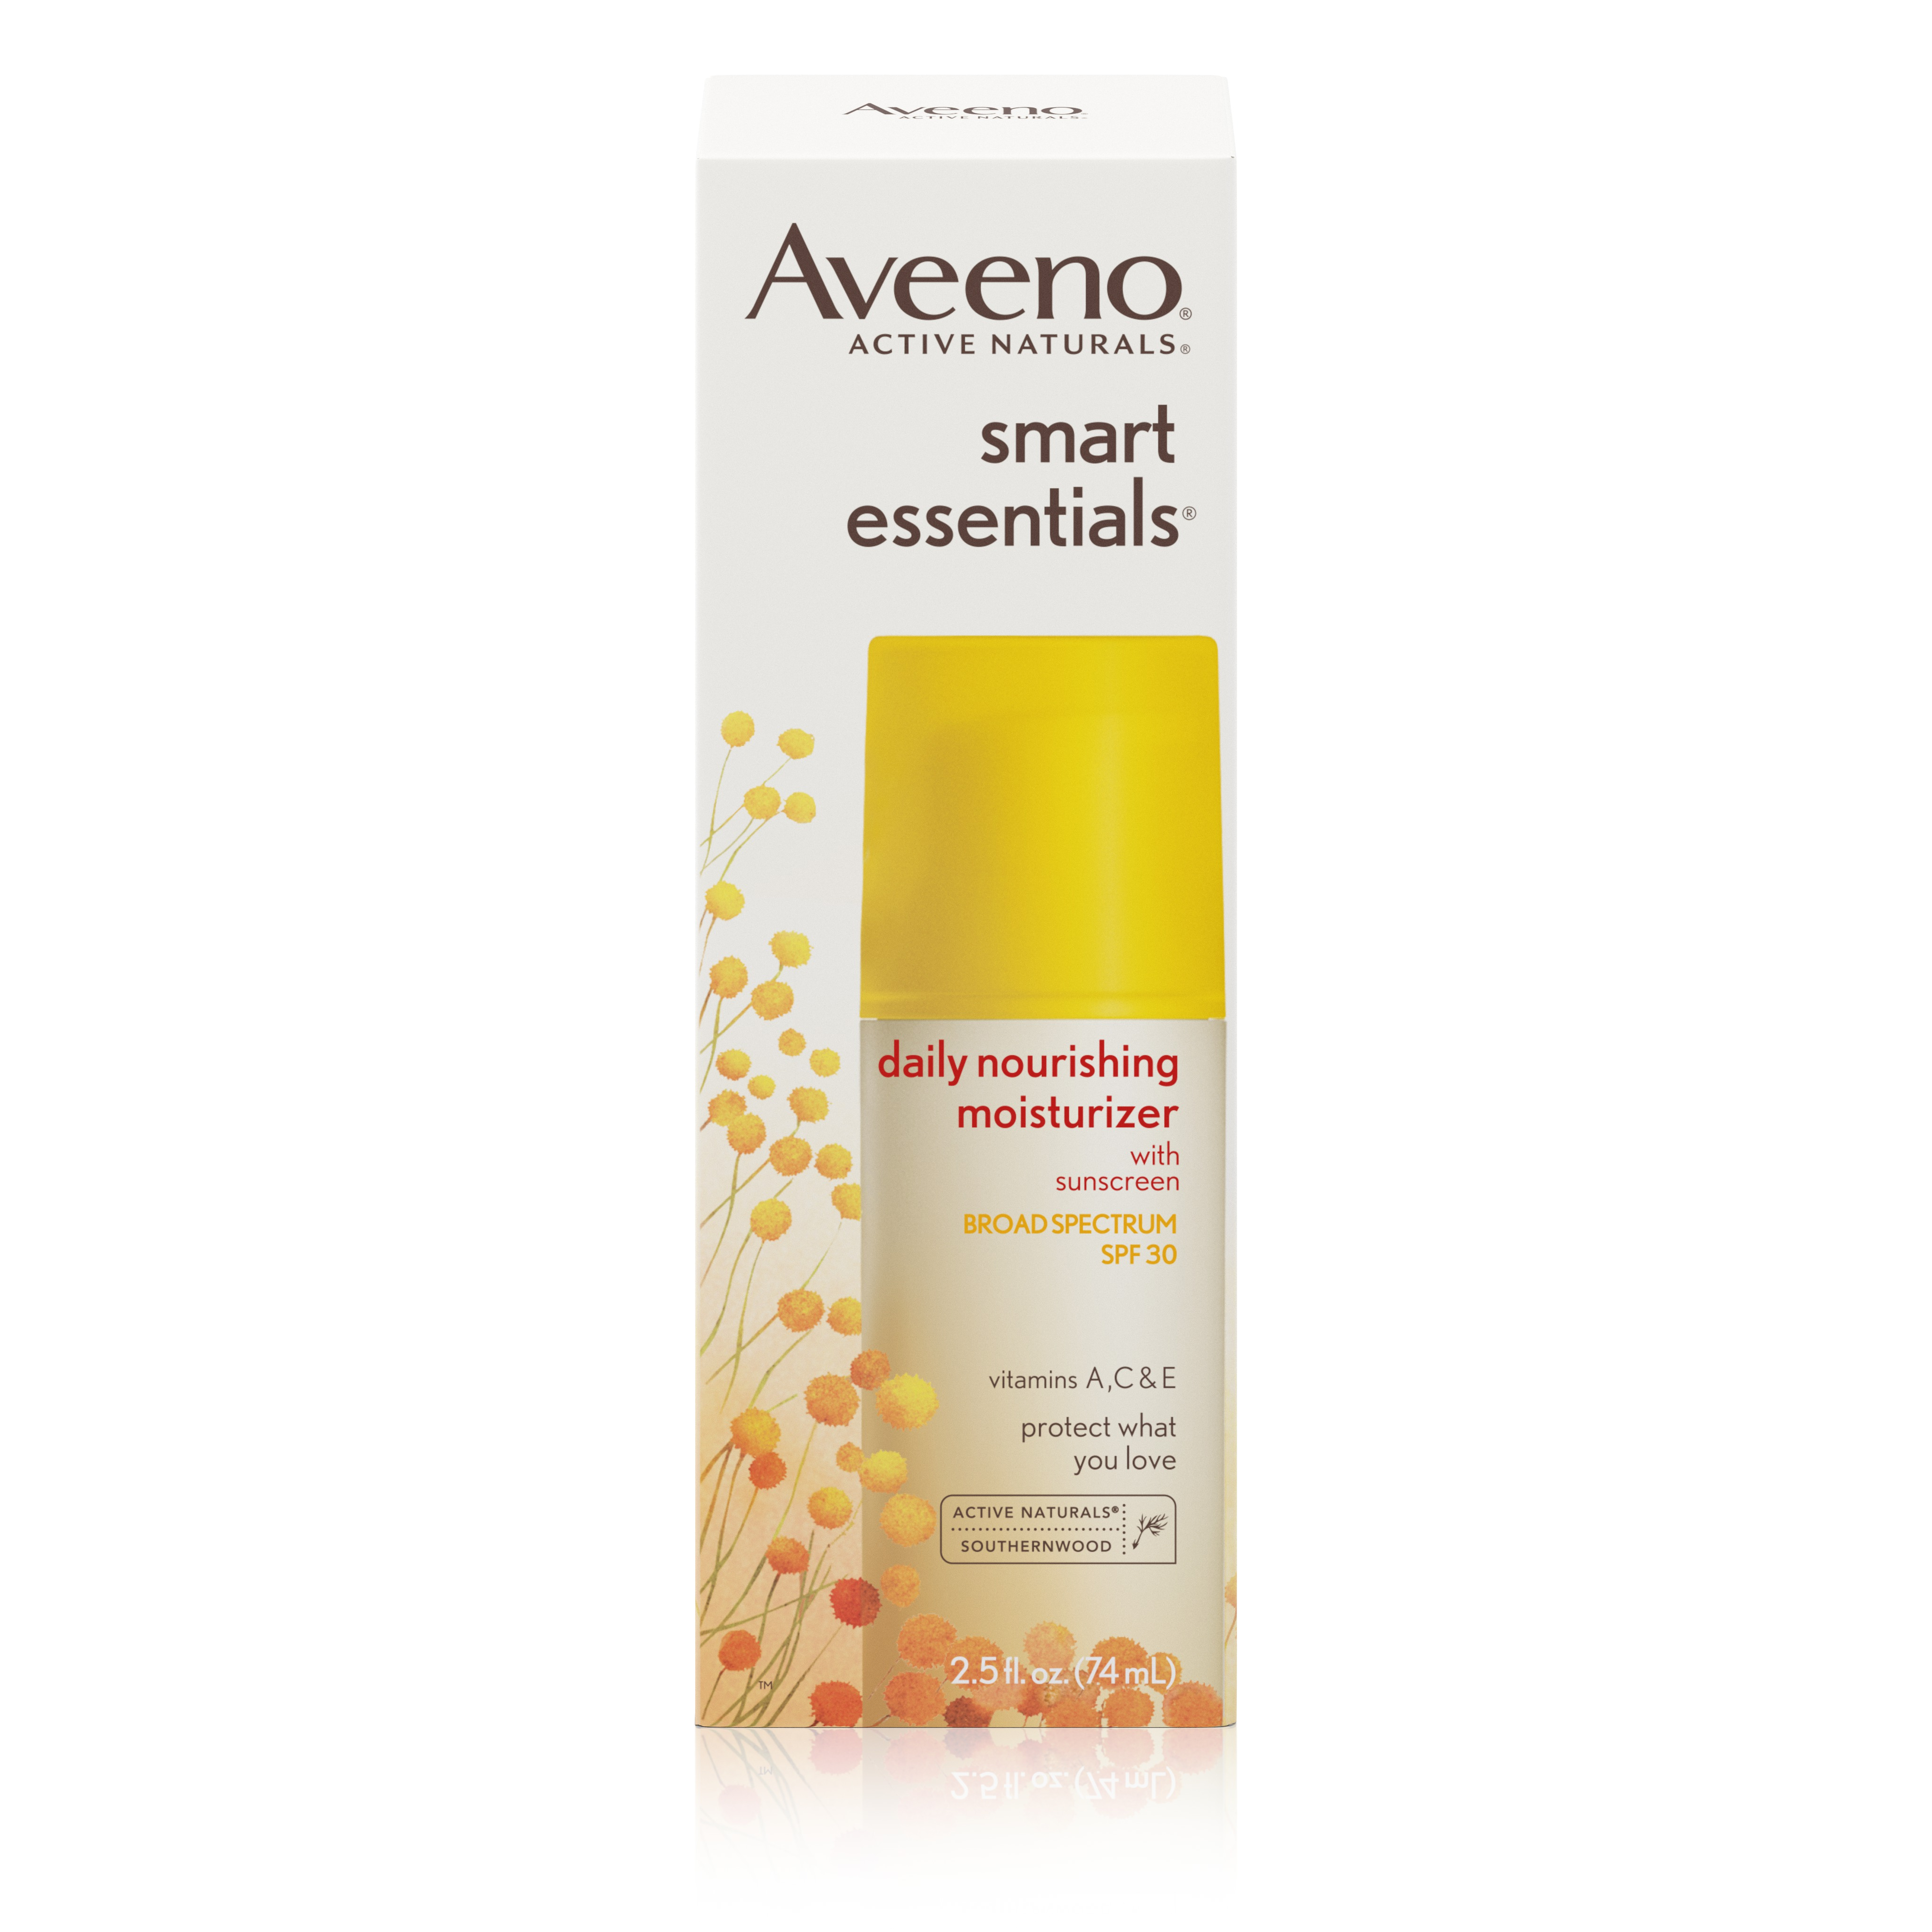 Aveeno Smart Essentials Daily Nourishing Moisturizer Oil Free With Broad Spectrum Spf 30, 2.5 Oz - Walmart.com